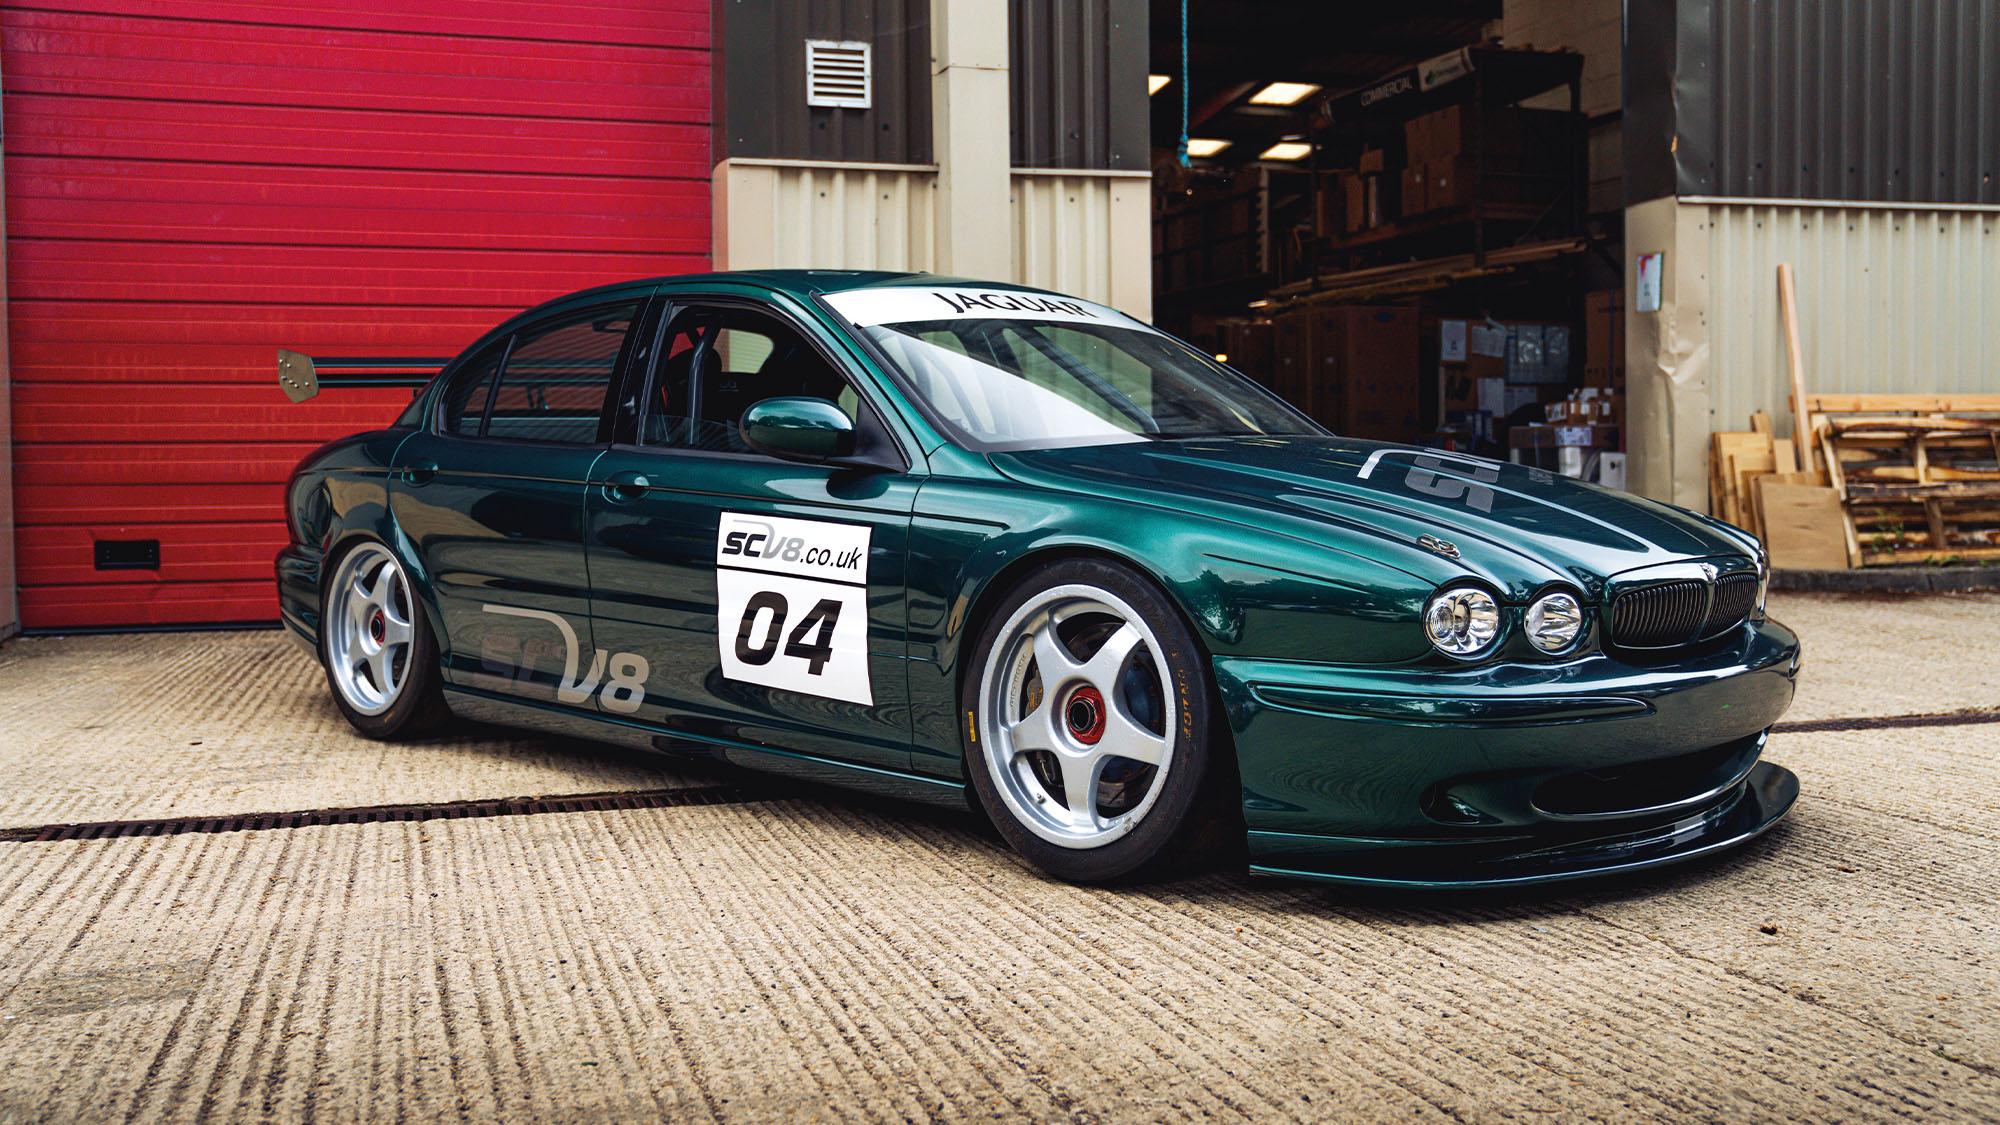 Jaguar X-type SCV8